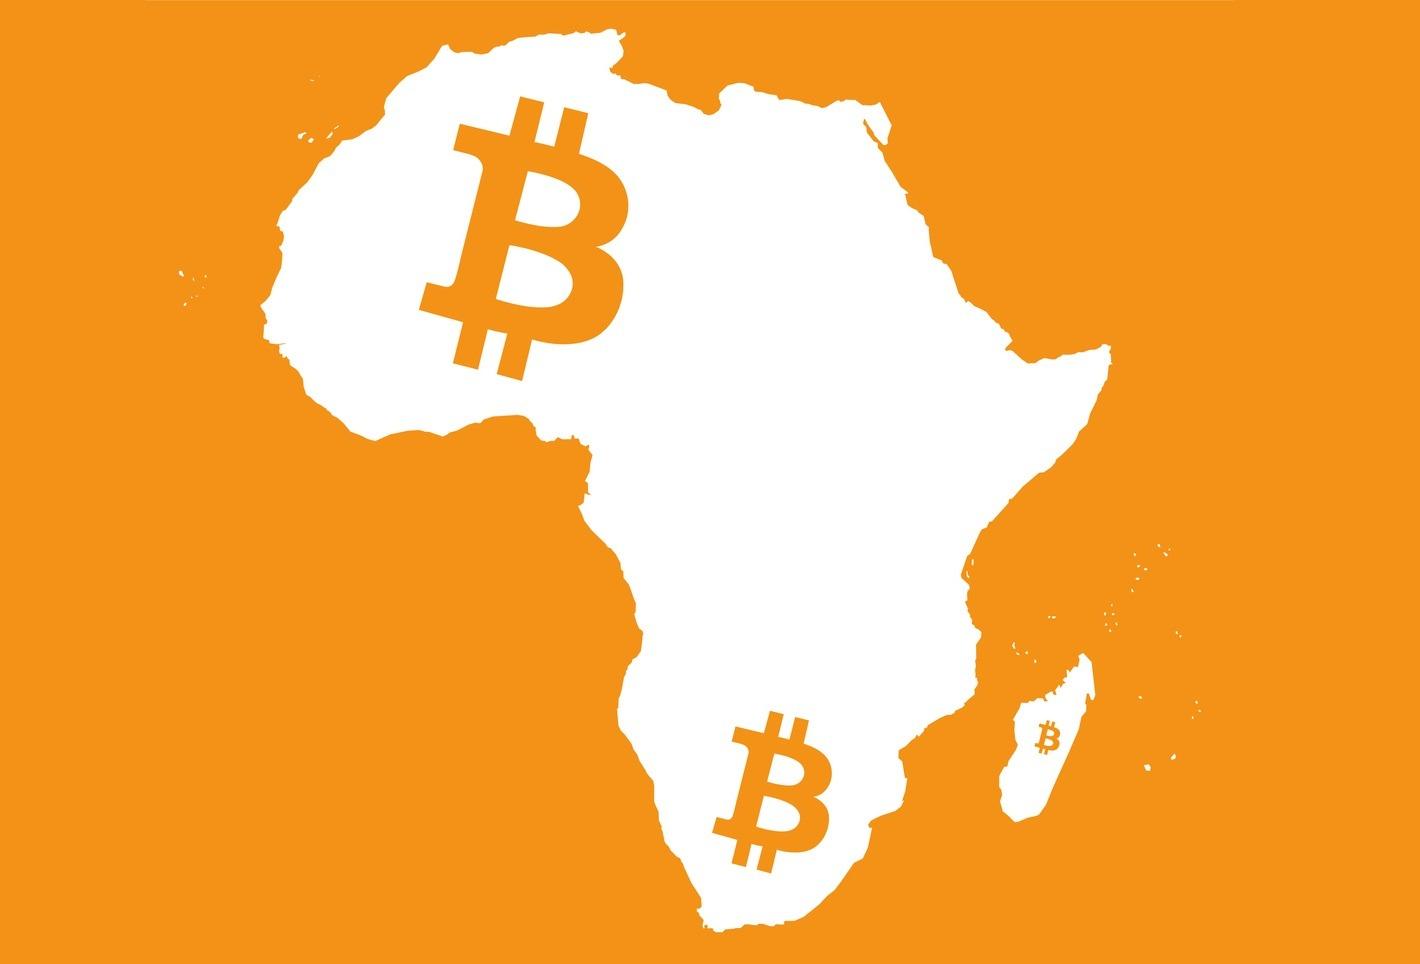 bitcoinin en populer oldugu kita afrika olacak